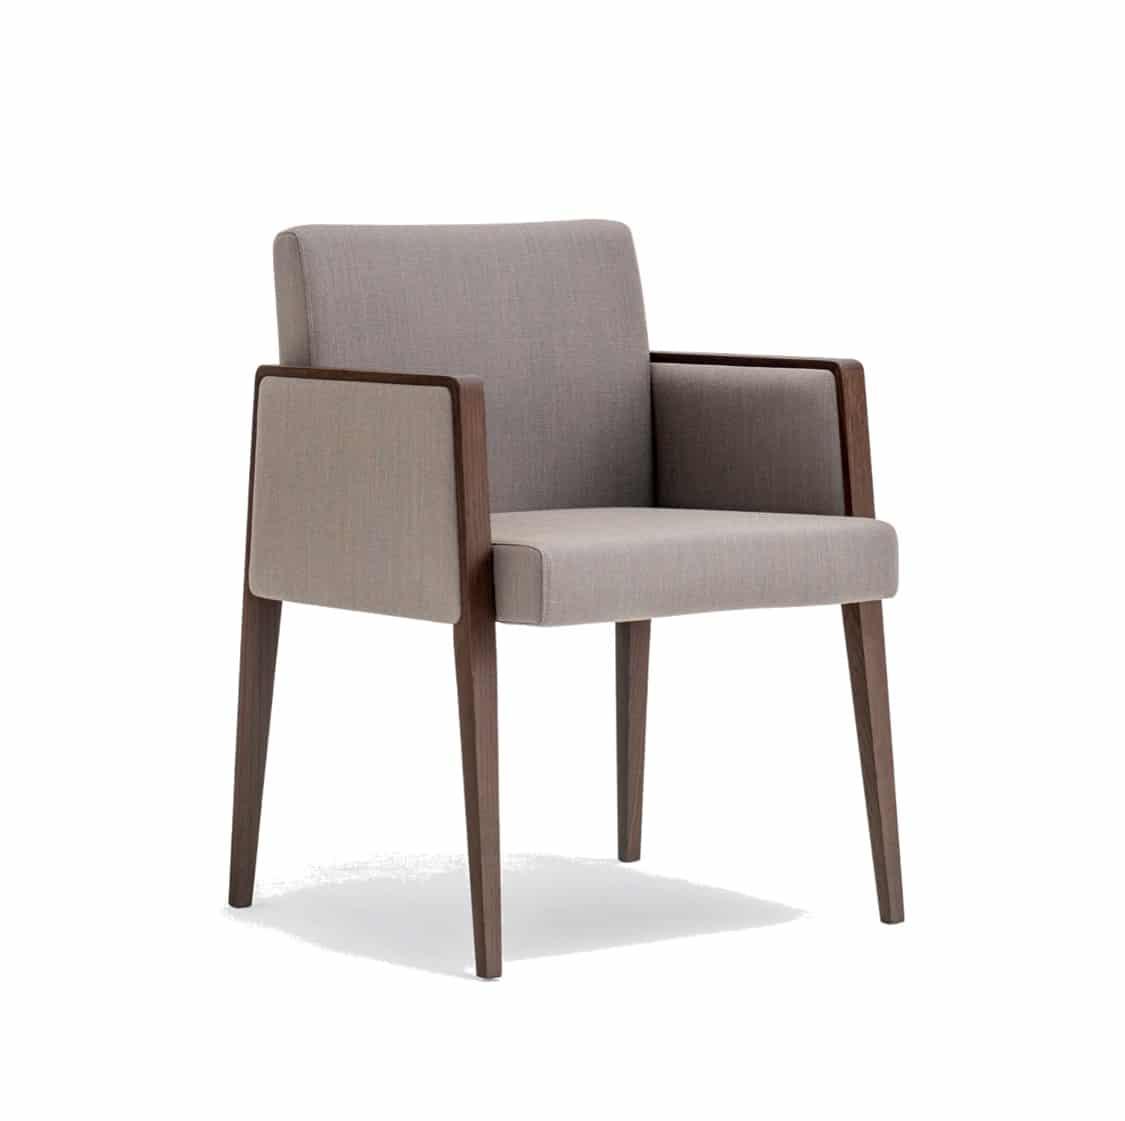 Jill Armchair Pedrali at DeFrae Contract Furniture Hero Image